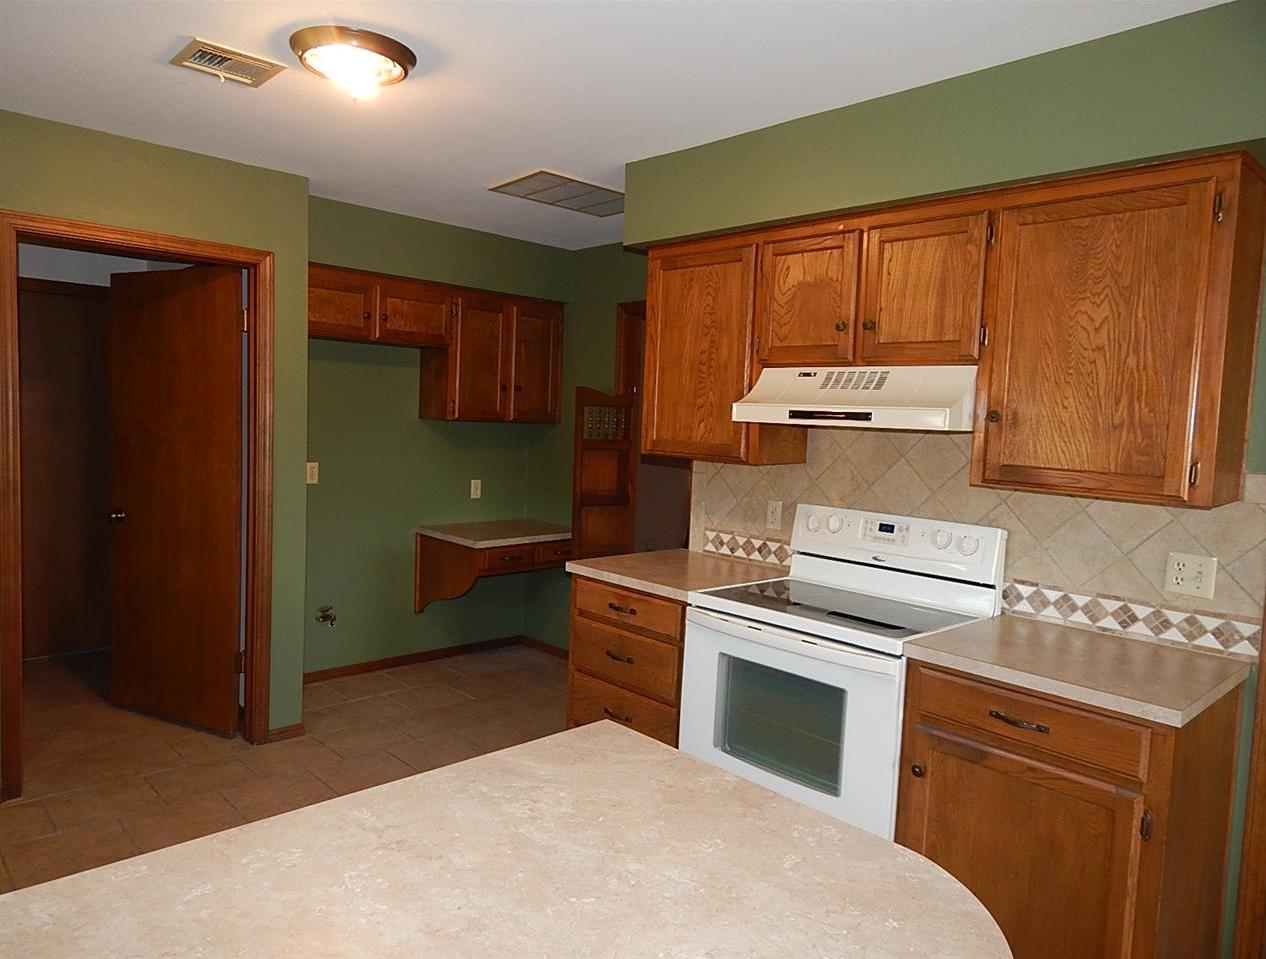 Sold Cross Sale W/ MLS | 2312 Calvert Ponca City, OK 74601 8